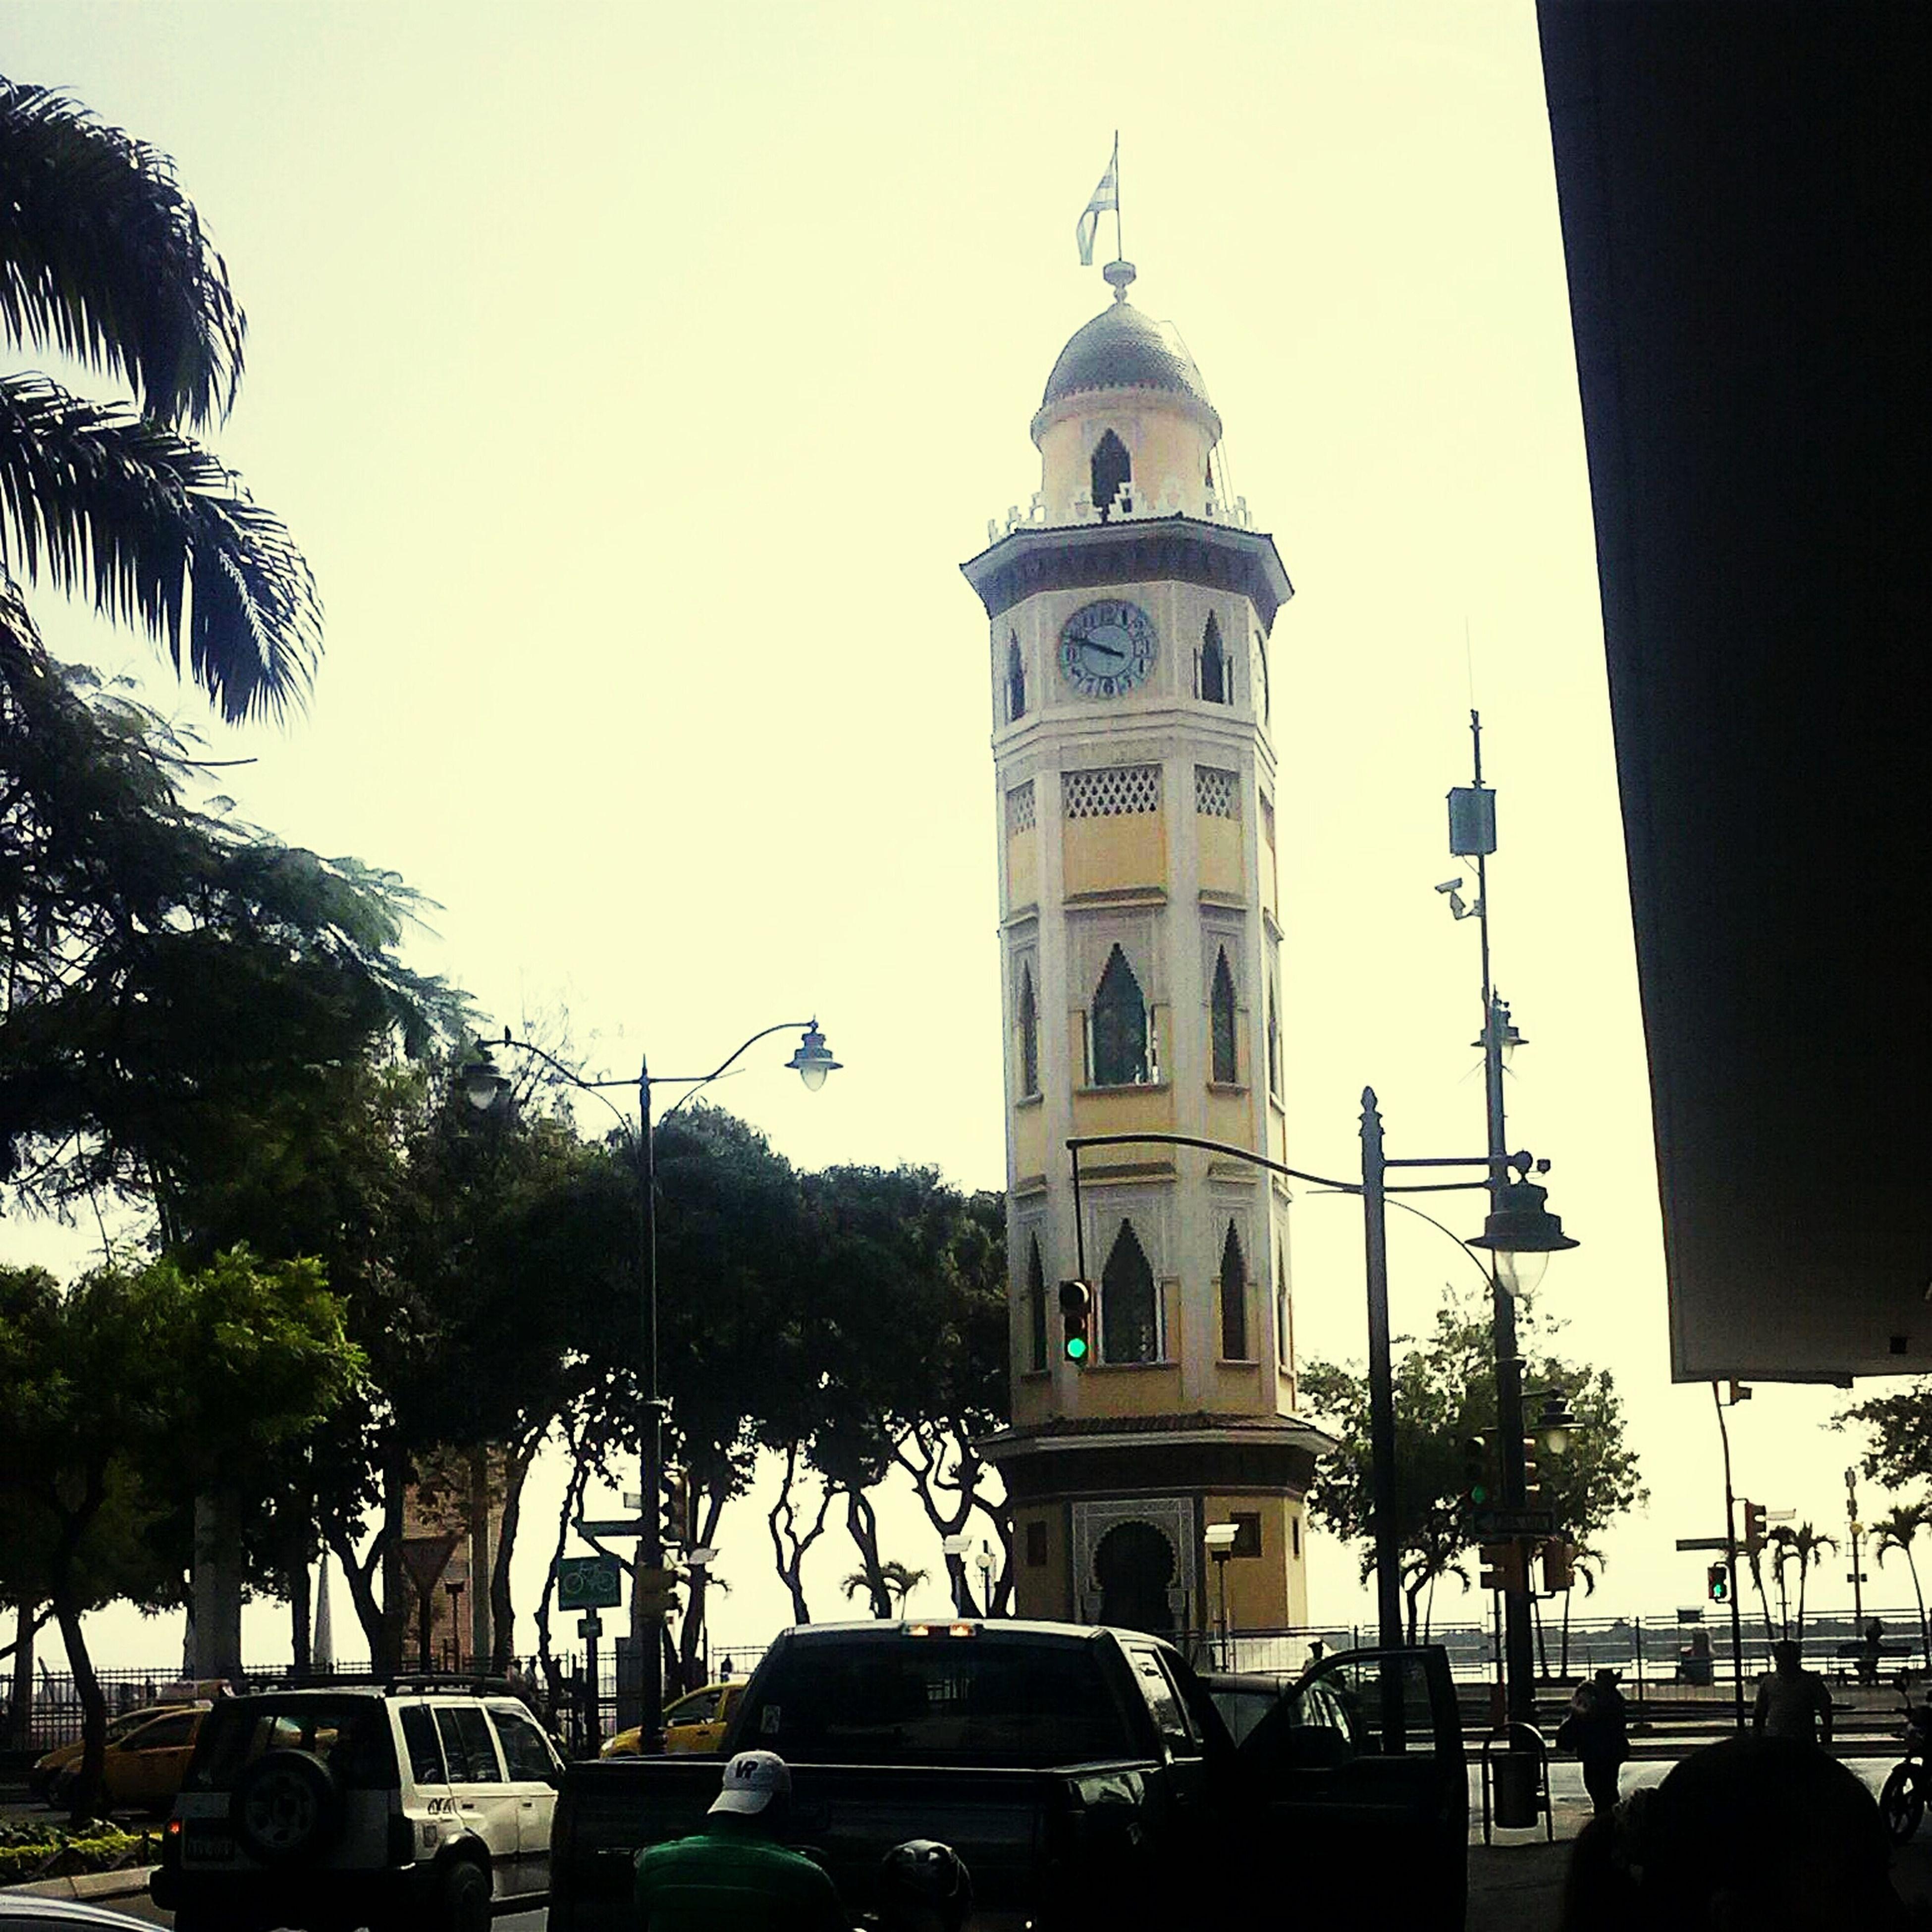 Architecture Streetphotography Taking Photos Clocks en Malecón Simon Bolivar o 2000, Patrimonio de Guayaquil